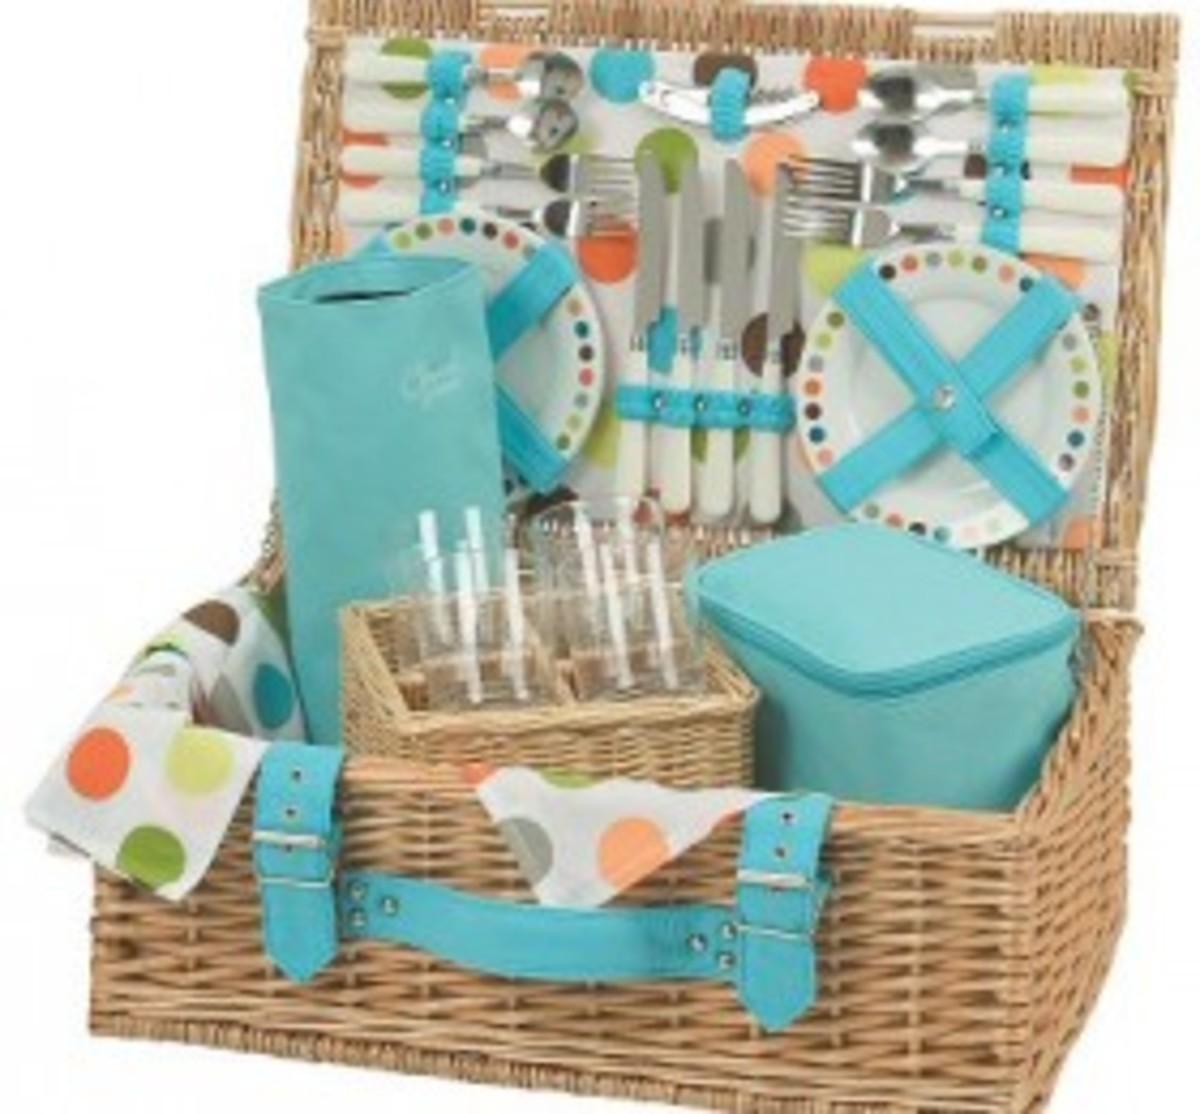 4p-Dotty-Spot-picnic-basket-md-280x260